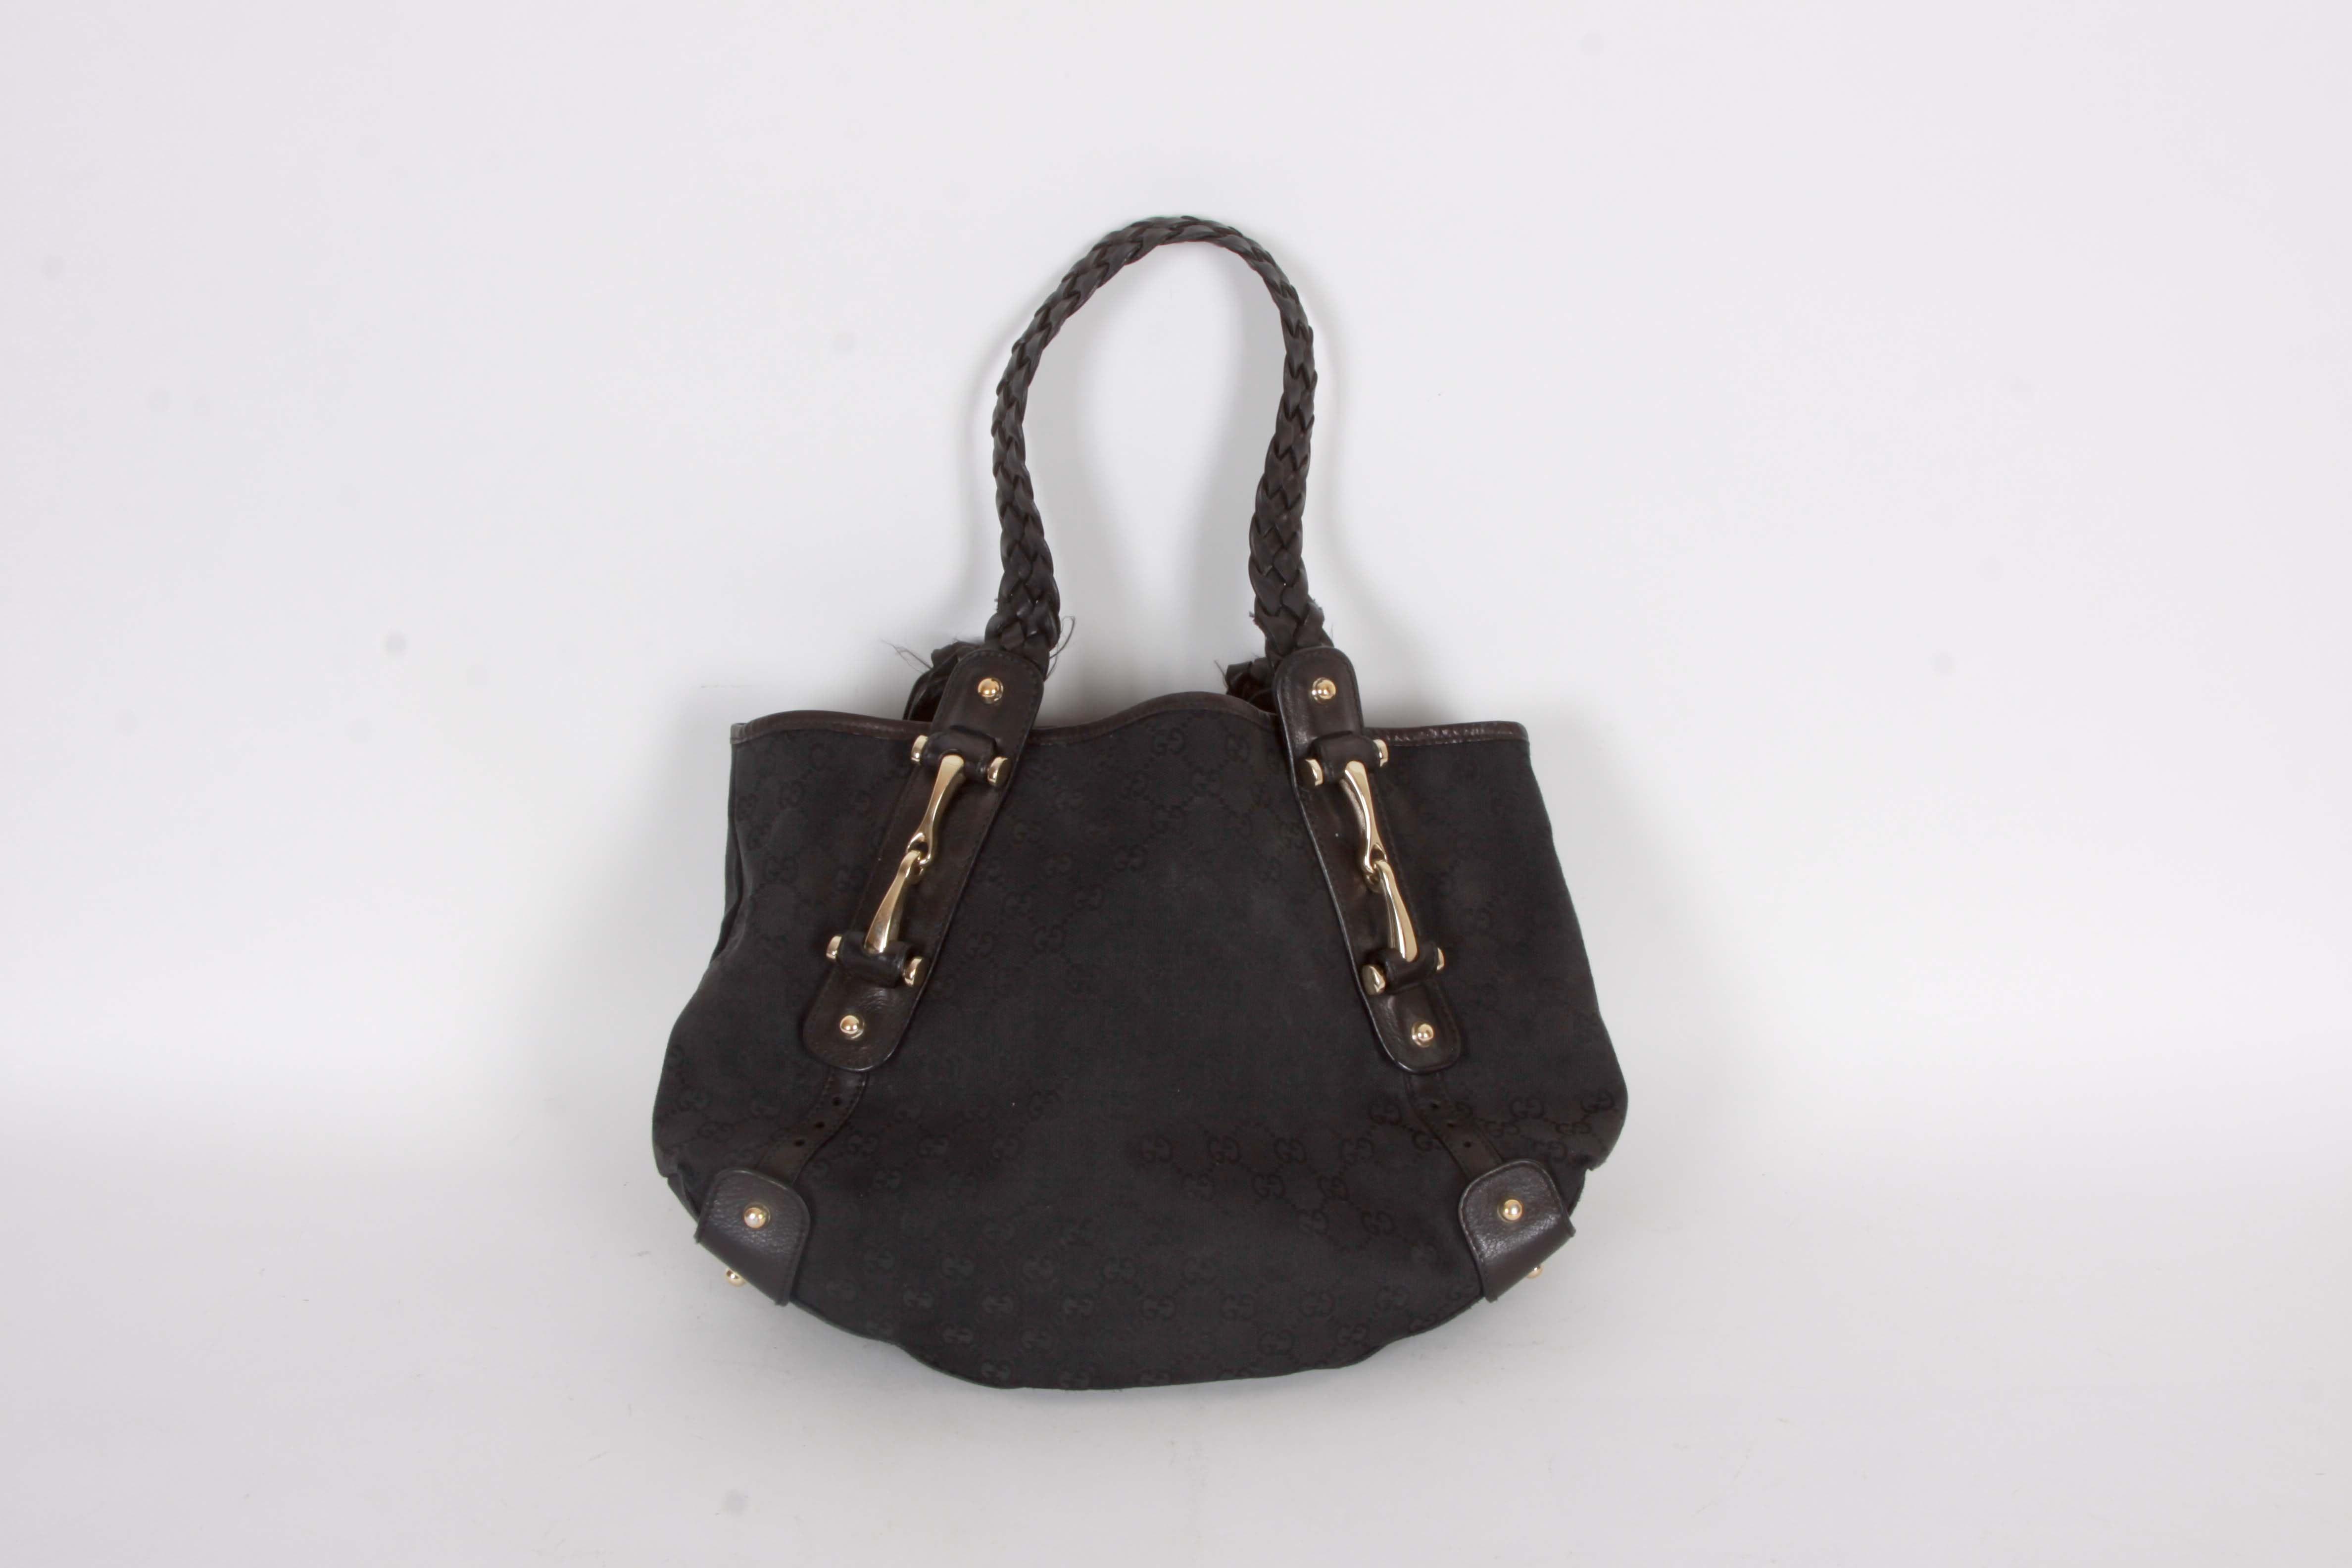 Gucci Monogram Canvas and Leather Handbag